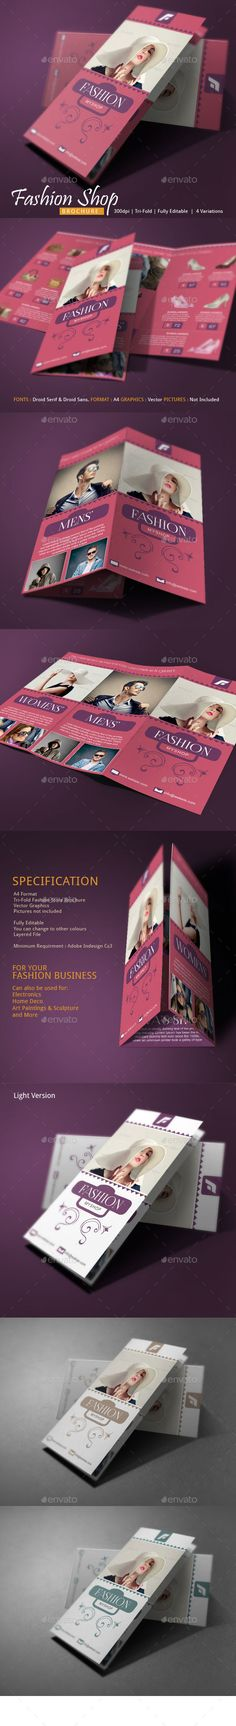 Pinterest \u2022 The world\u0027s catalog of ideas - fashion design brochure template